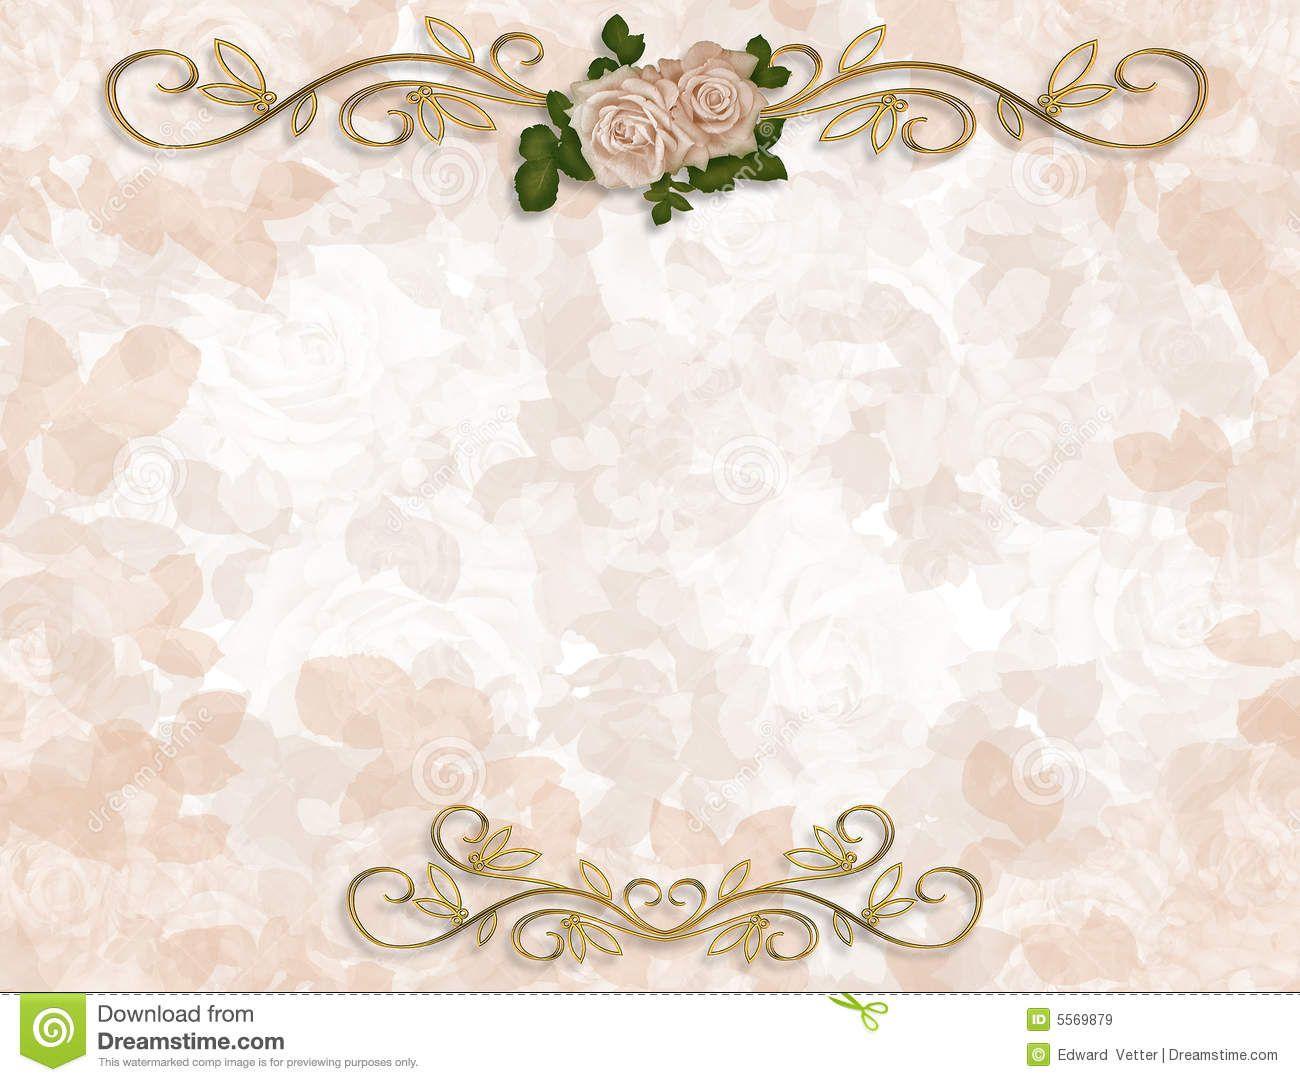 wedding invitation background design